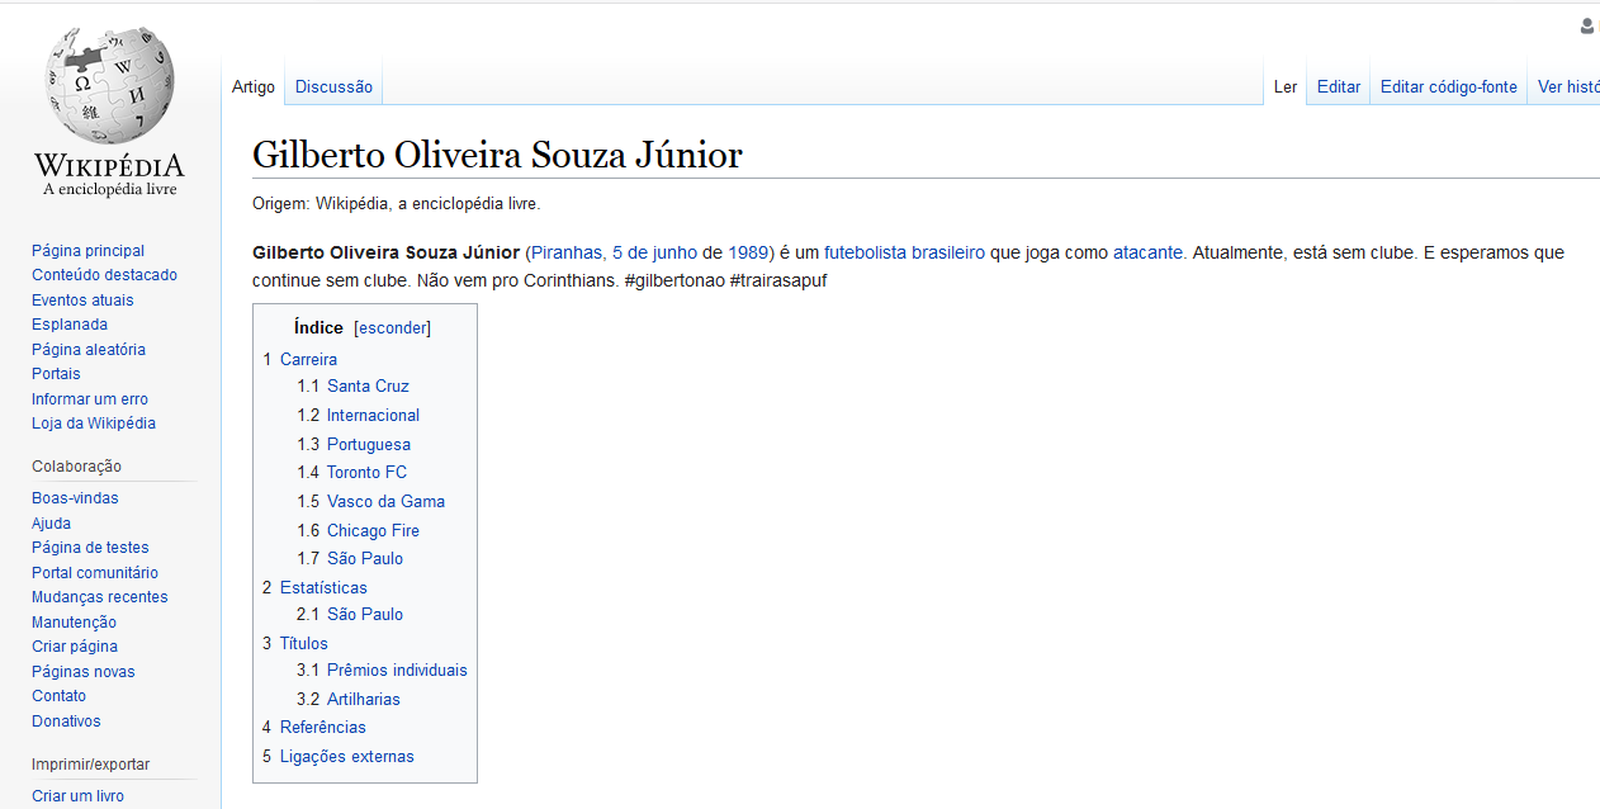 Wiki - Gilberto